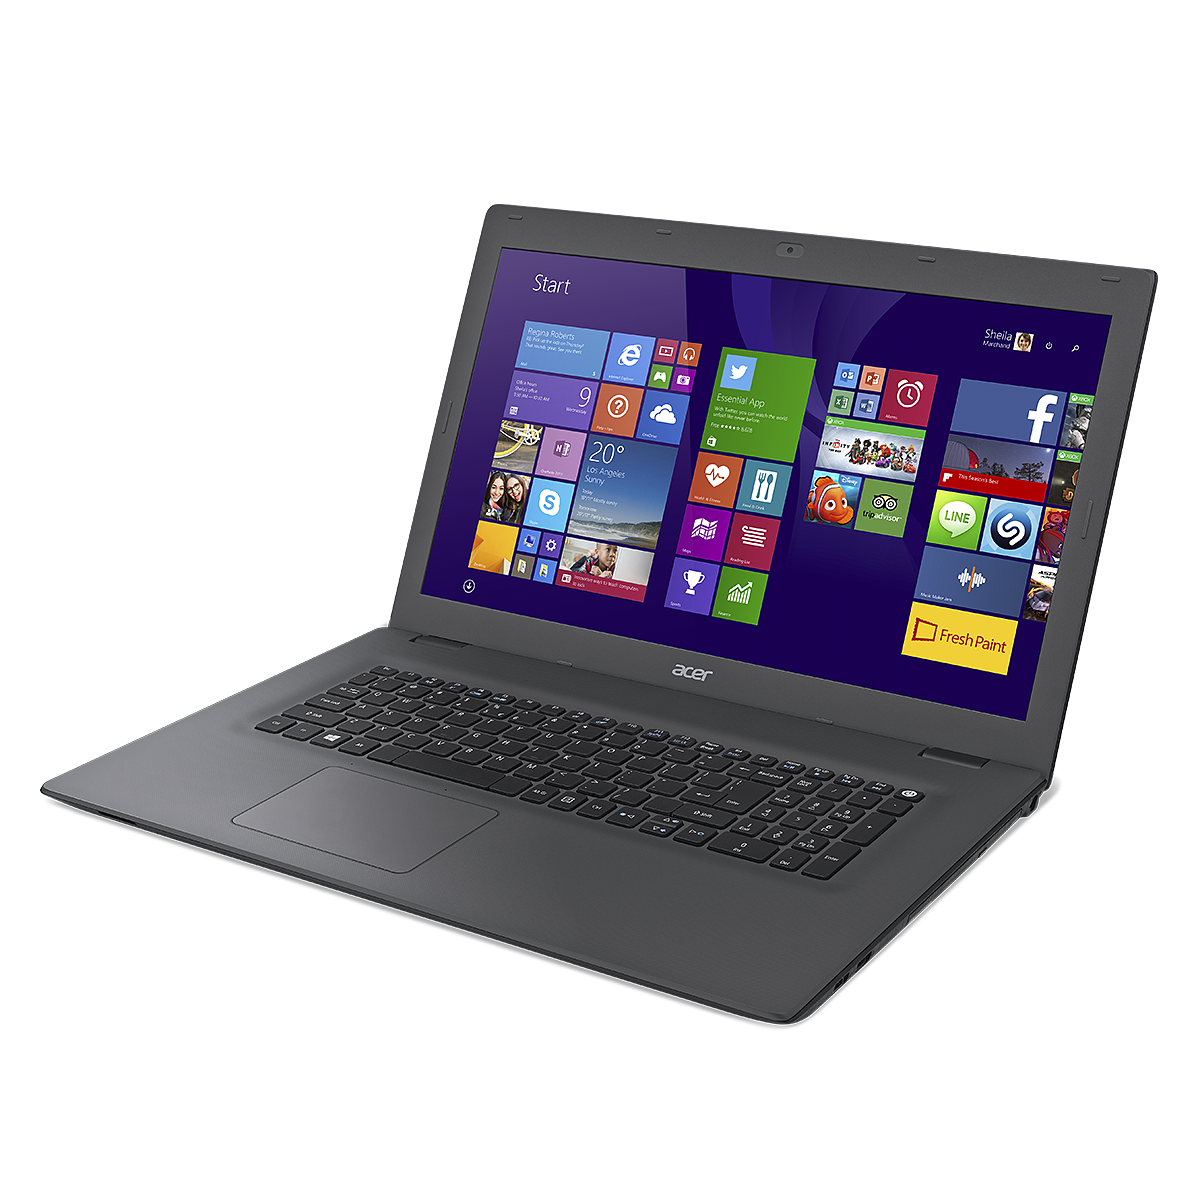 aspire e5 722 laptops tech specs reviews acer. Black Bedroom Furniture Sets. Home Design Ideas